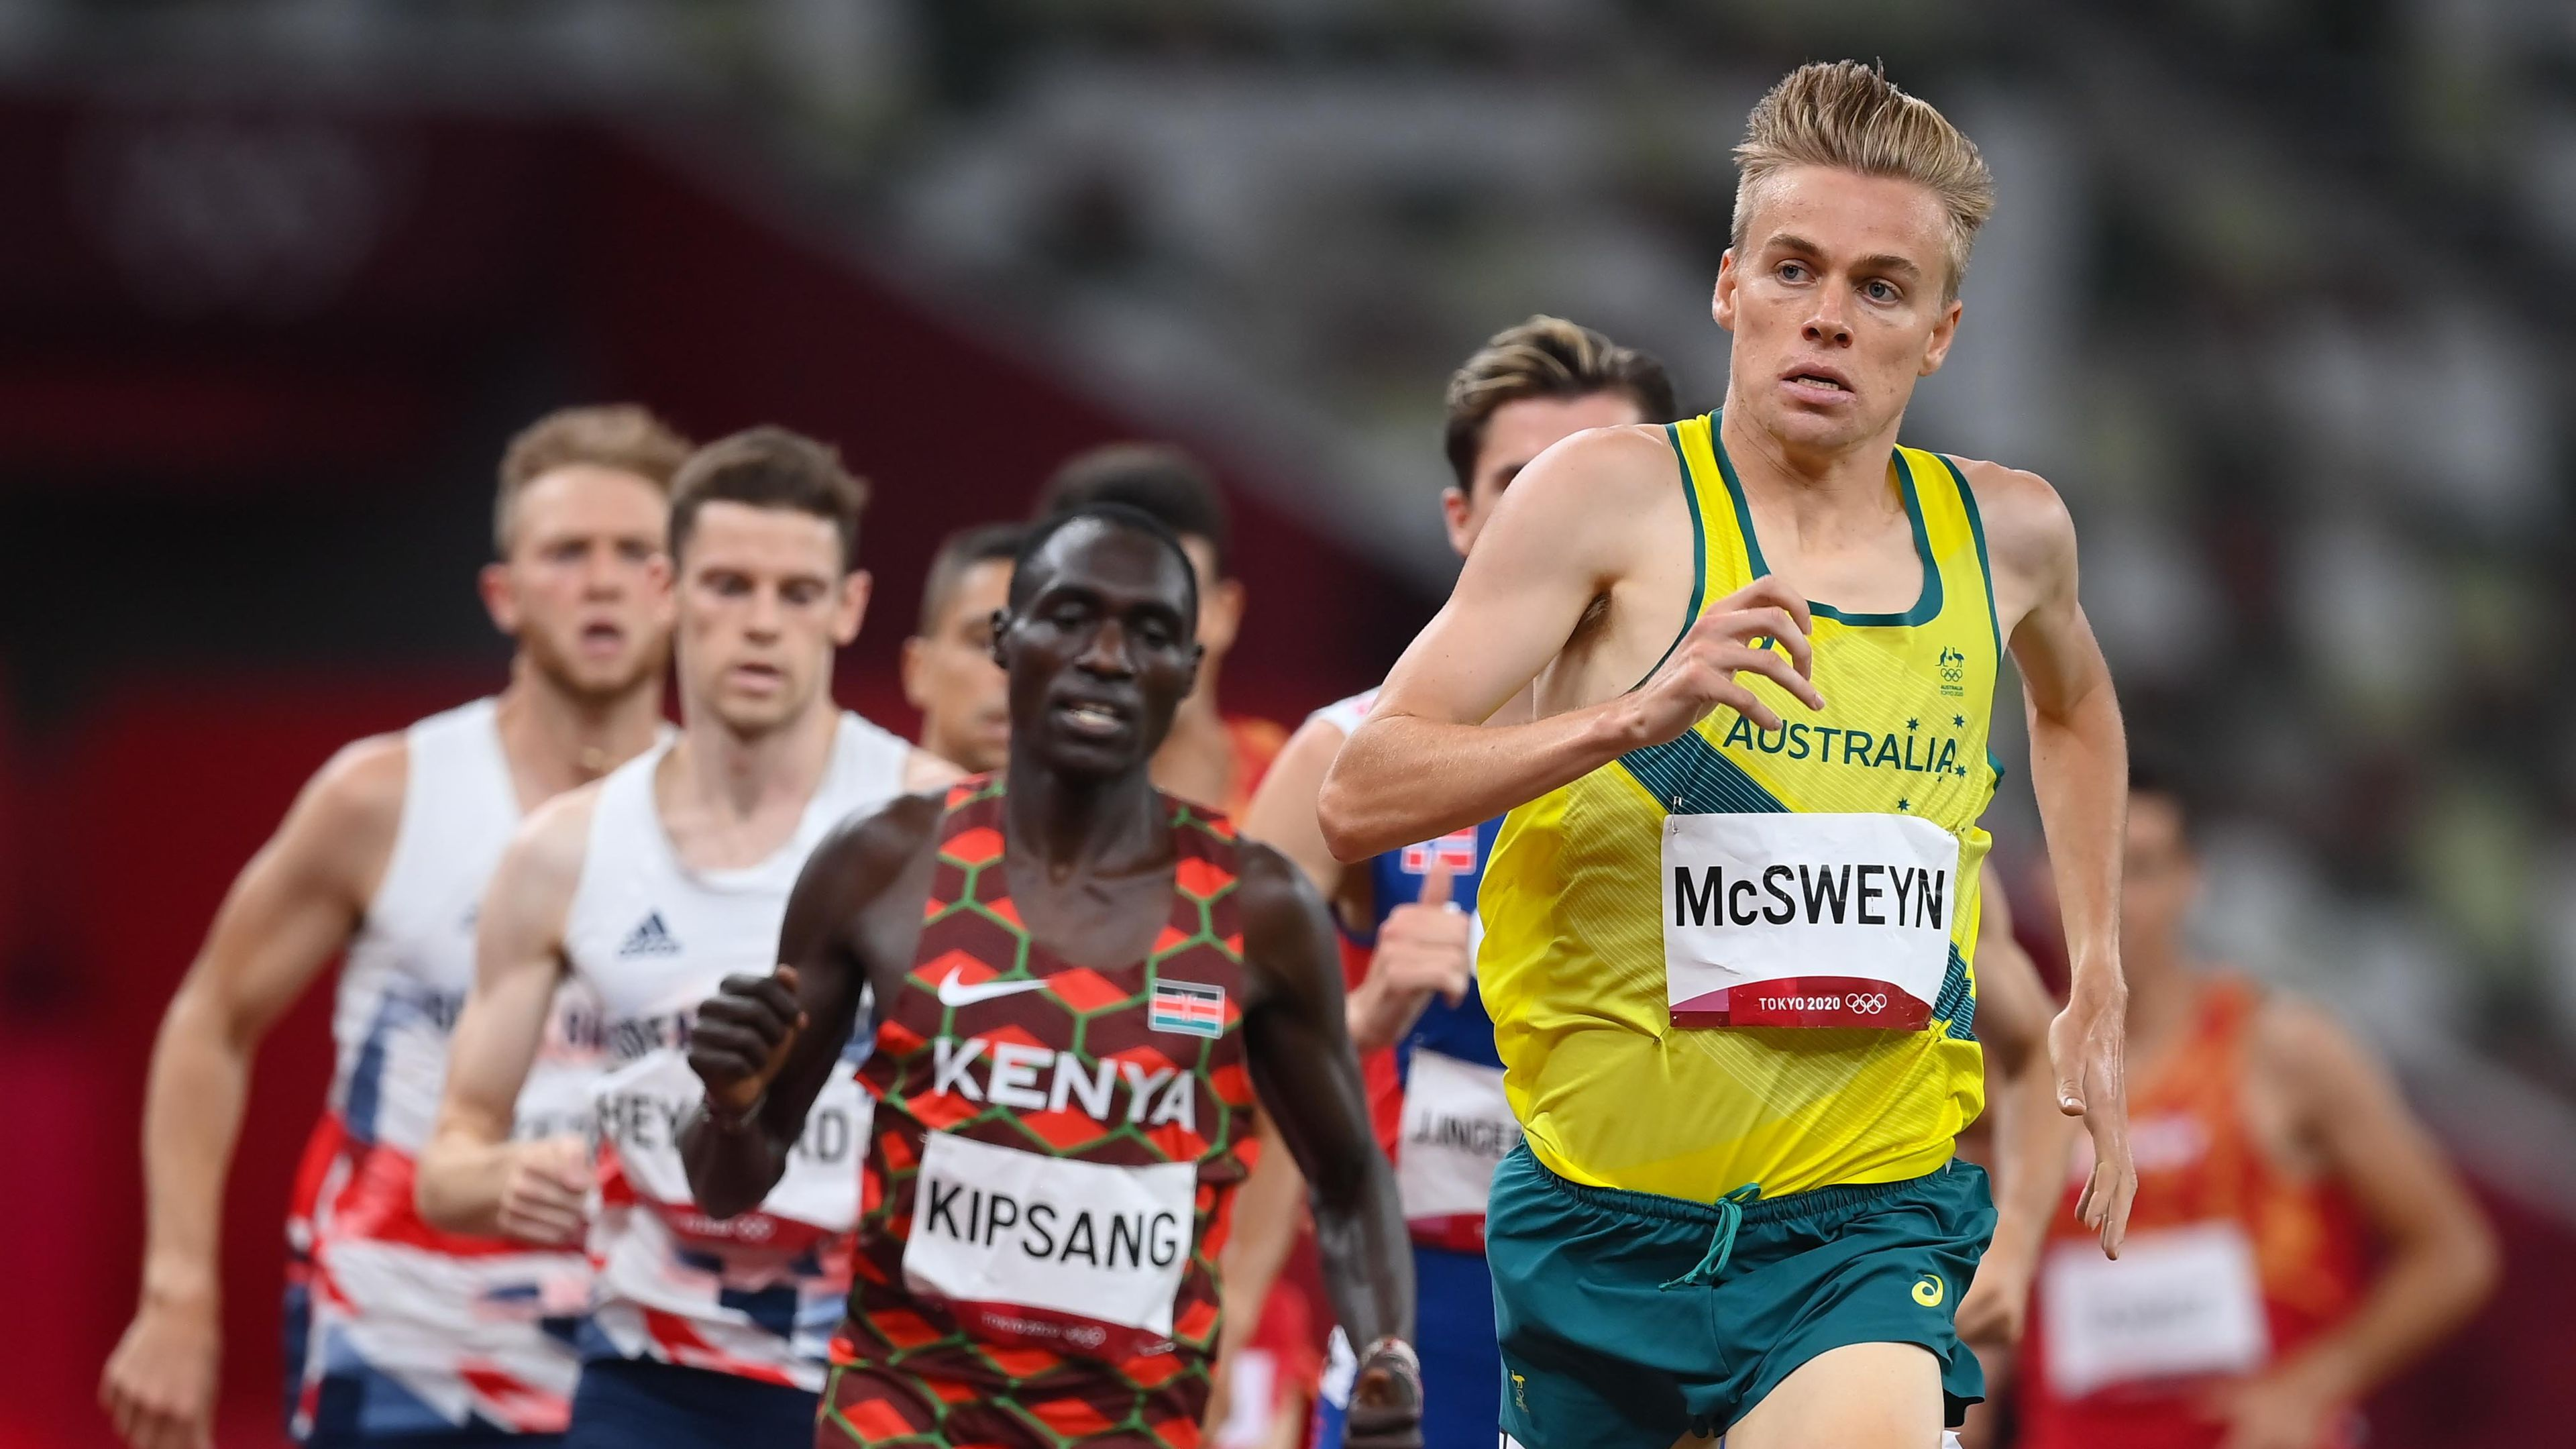 Australian duo Oli Hoare and Stewart McSweyn create history in making the 1500m final